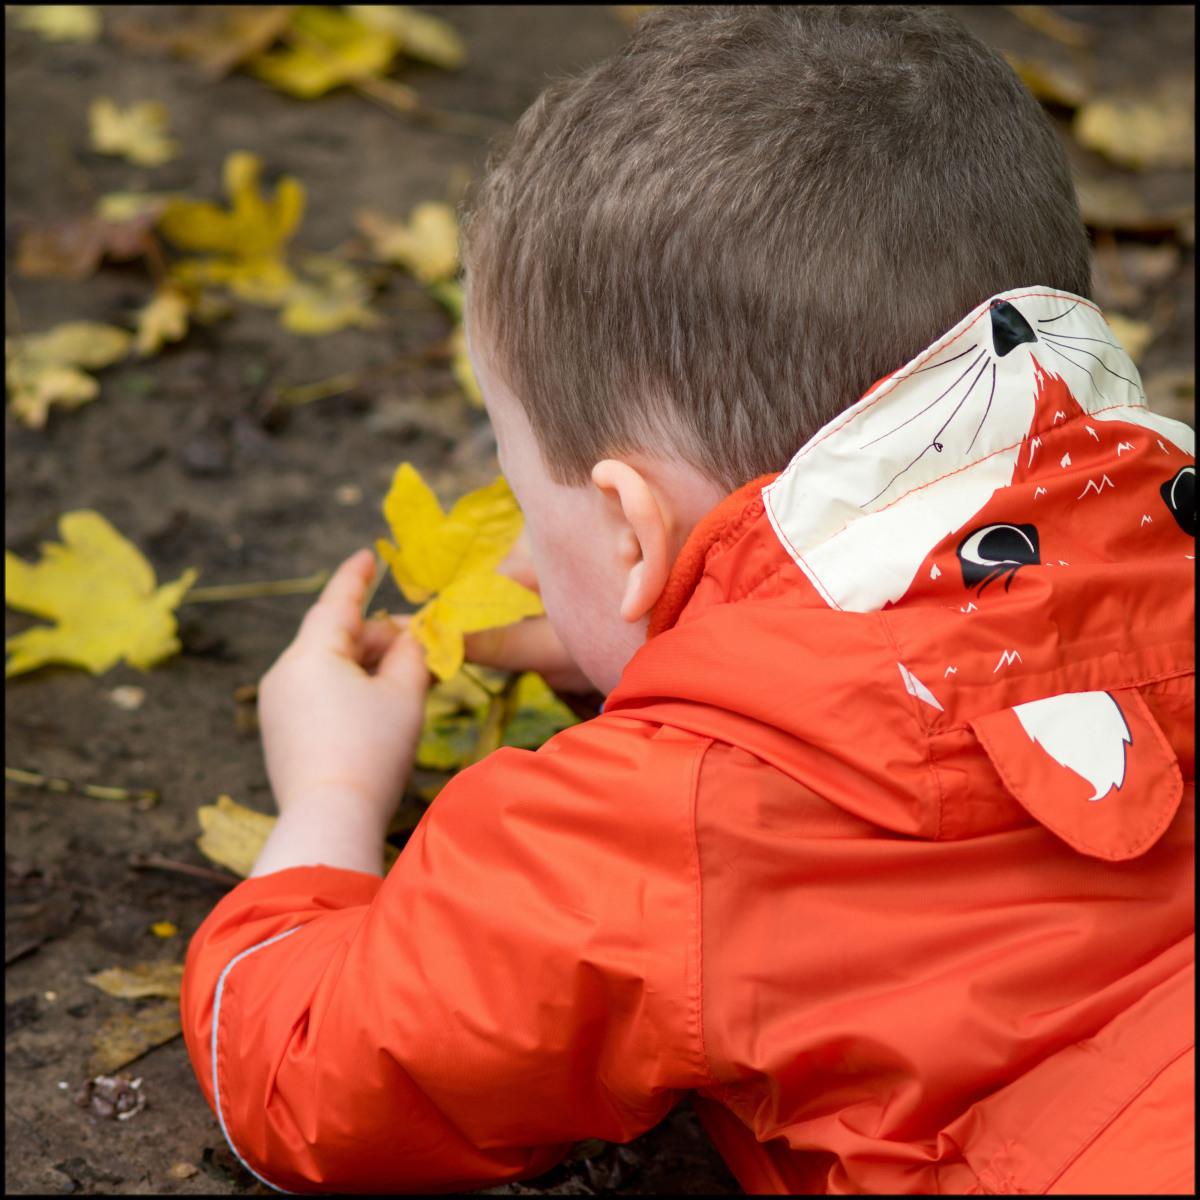 Outdoor-nursery-shoots-Sandra-Sergeant-Schools-Nursery-Photographer-Basingstoke